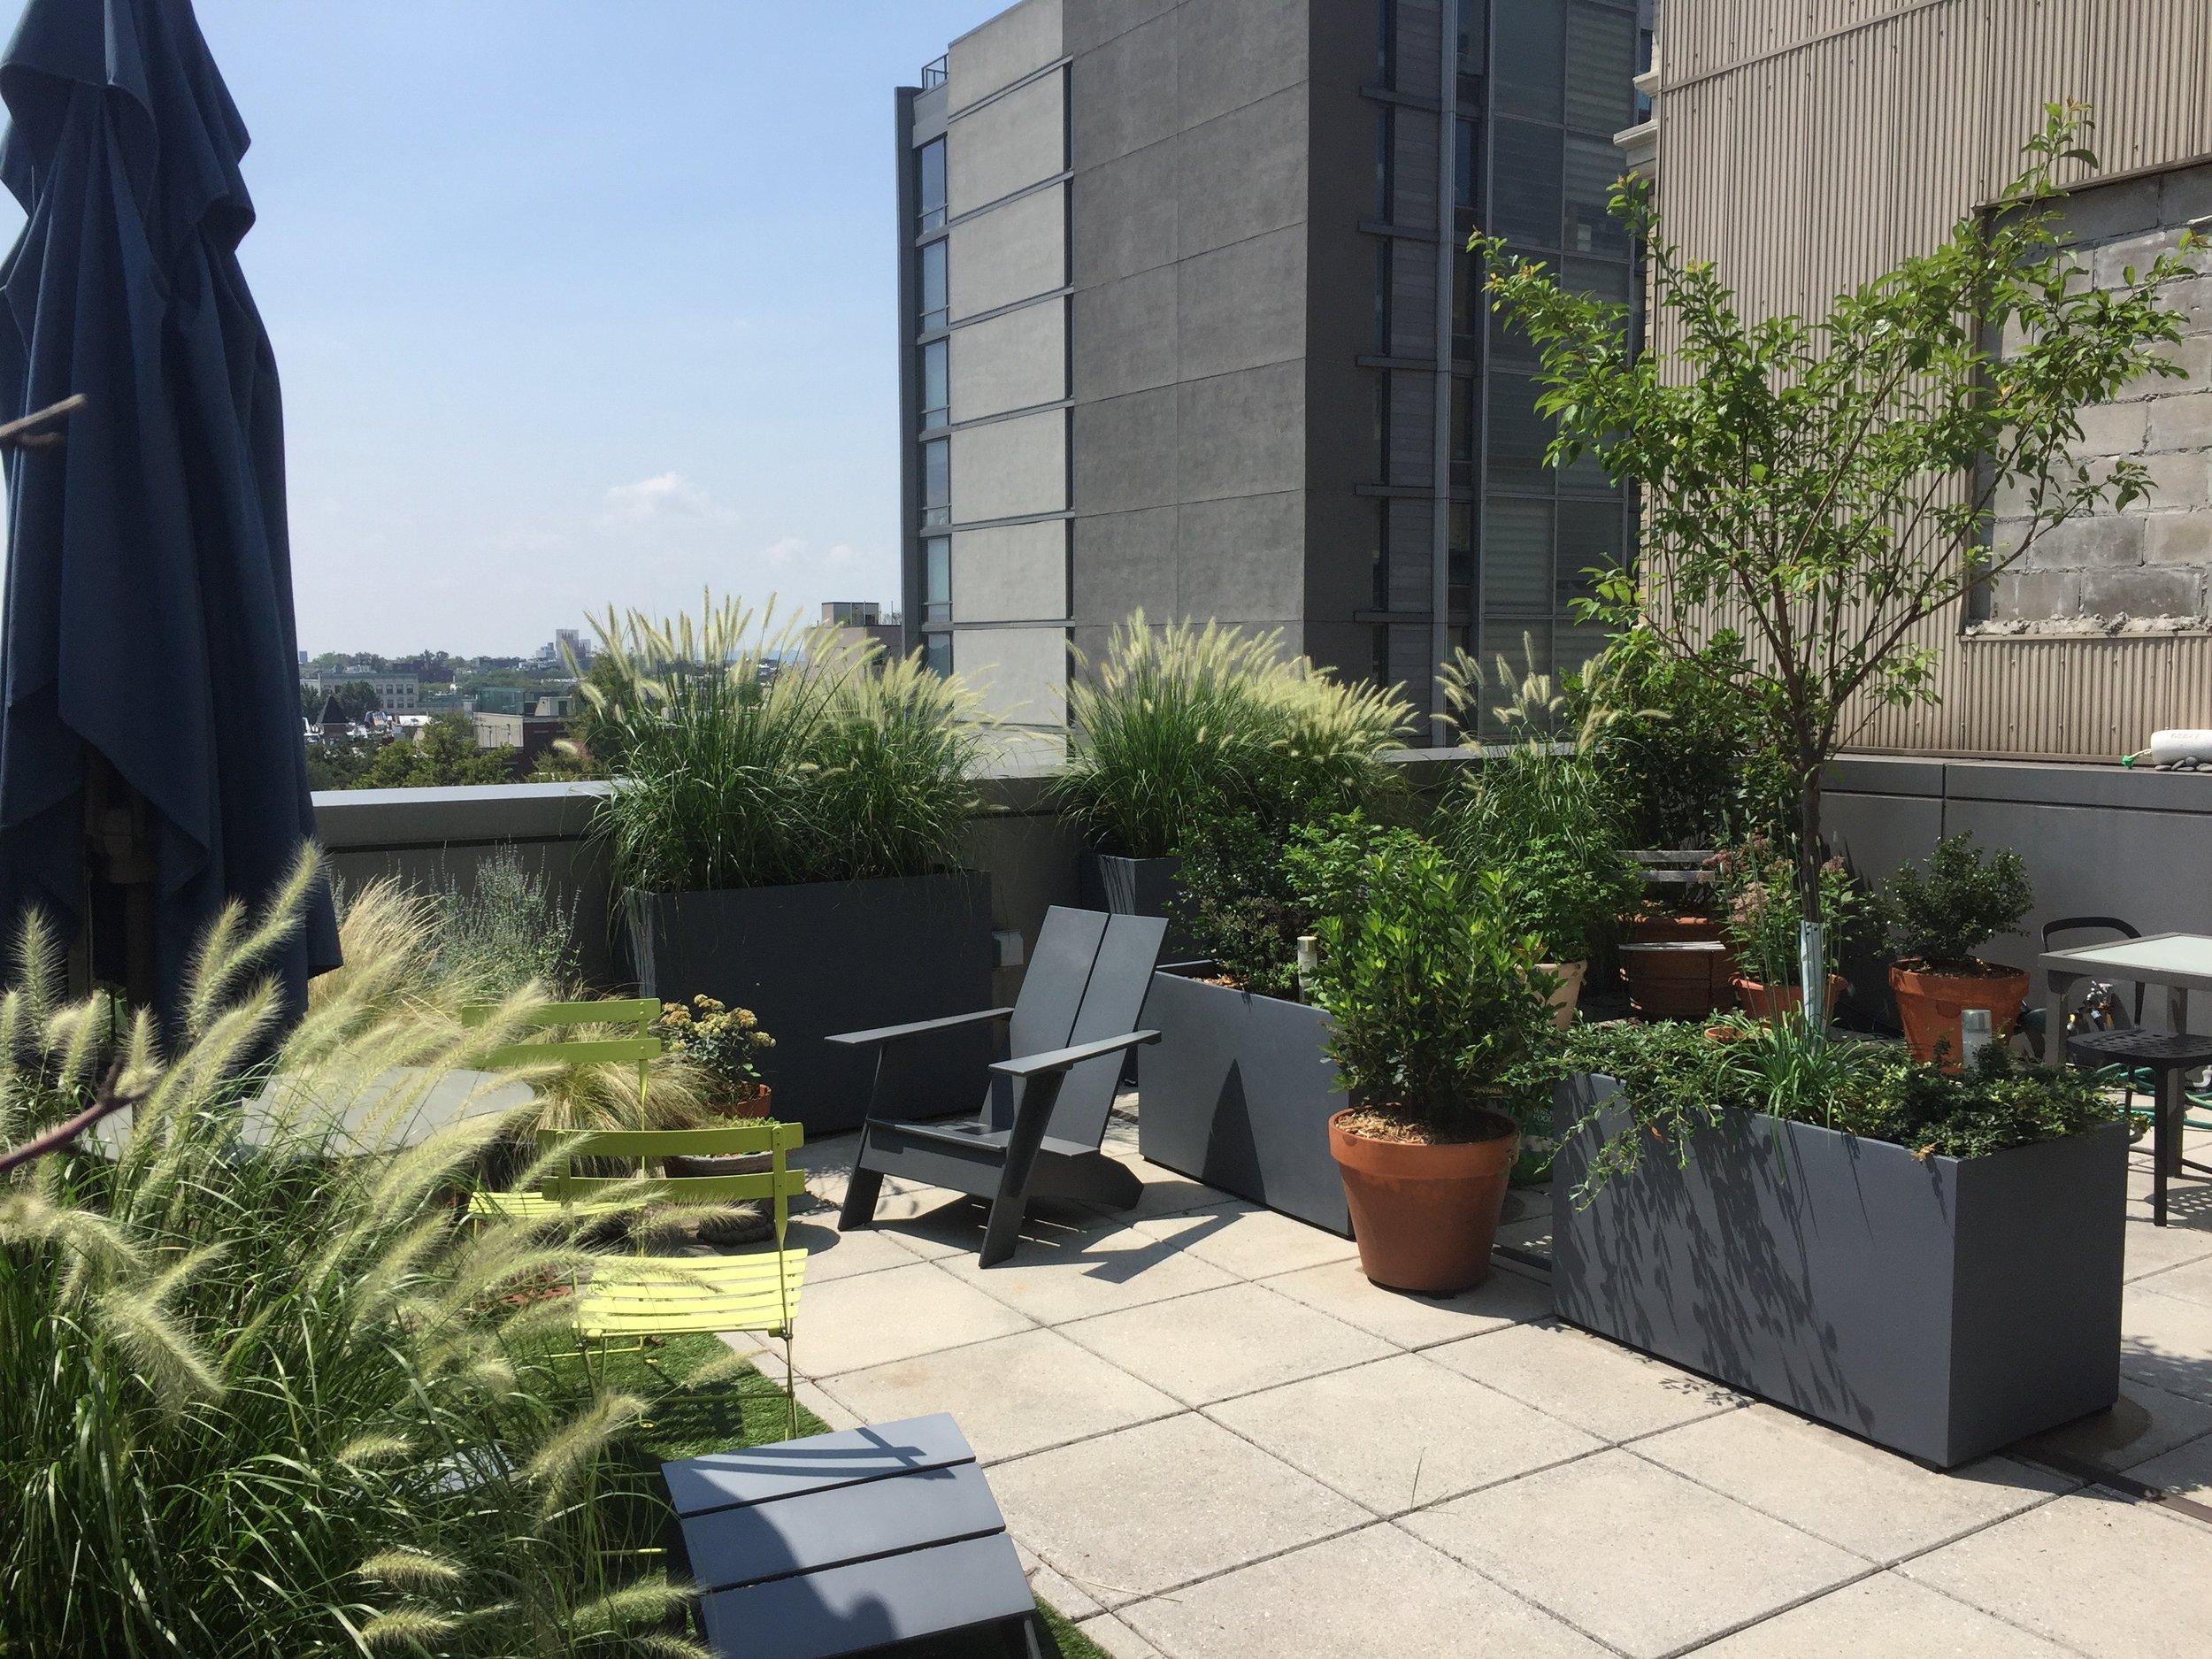 Brooklyn Rooftop Garden